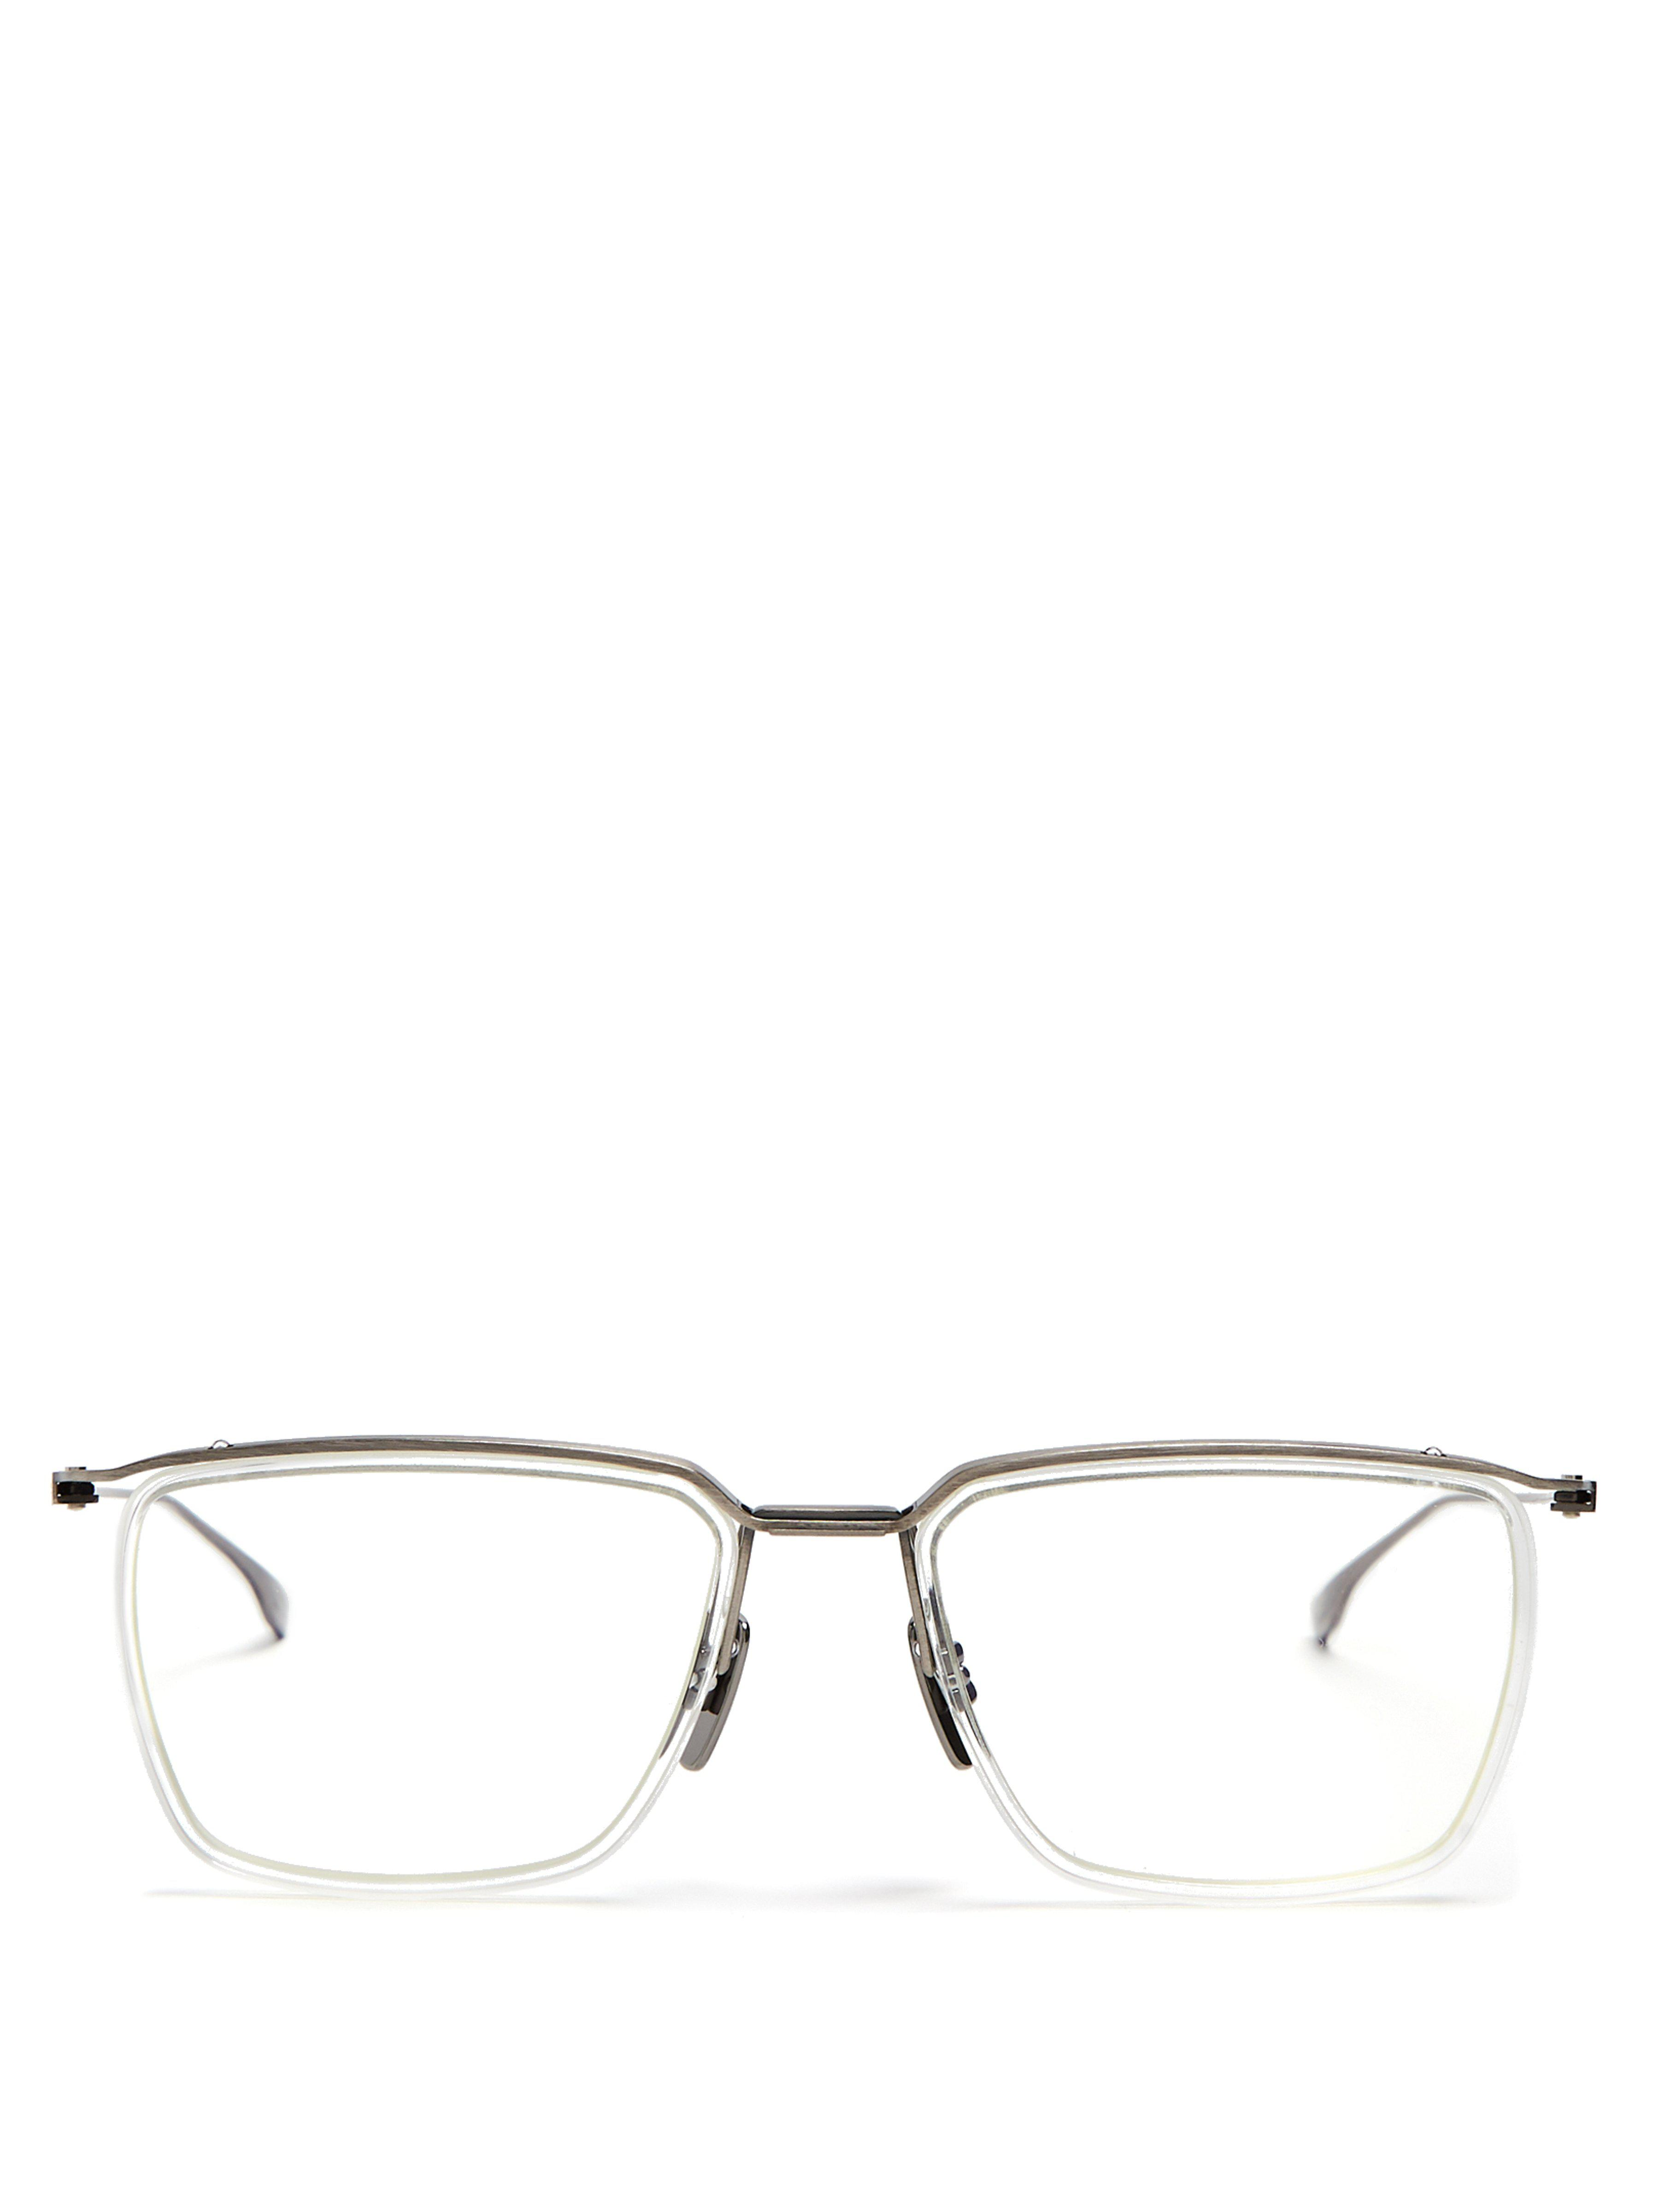 0d6d47356ca Dita Eyewear Schema Square Frame Glasses in Metallic for Men - Lyst